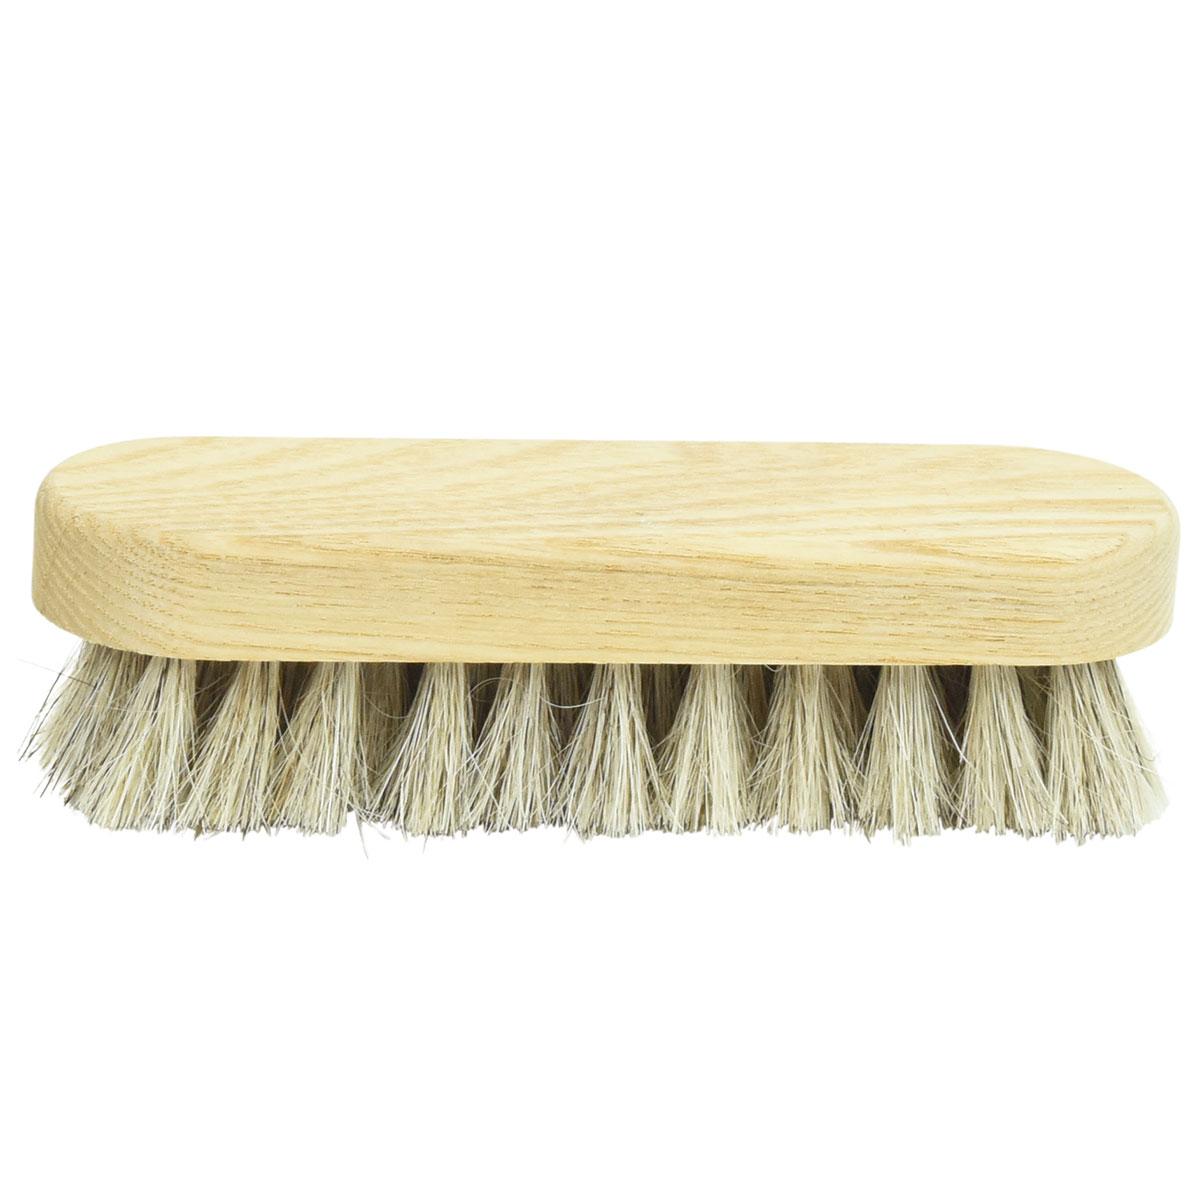 Bickmore Light Hat Brush